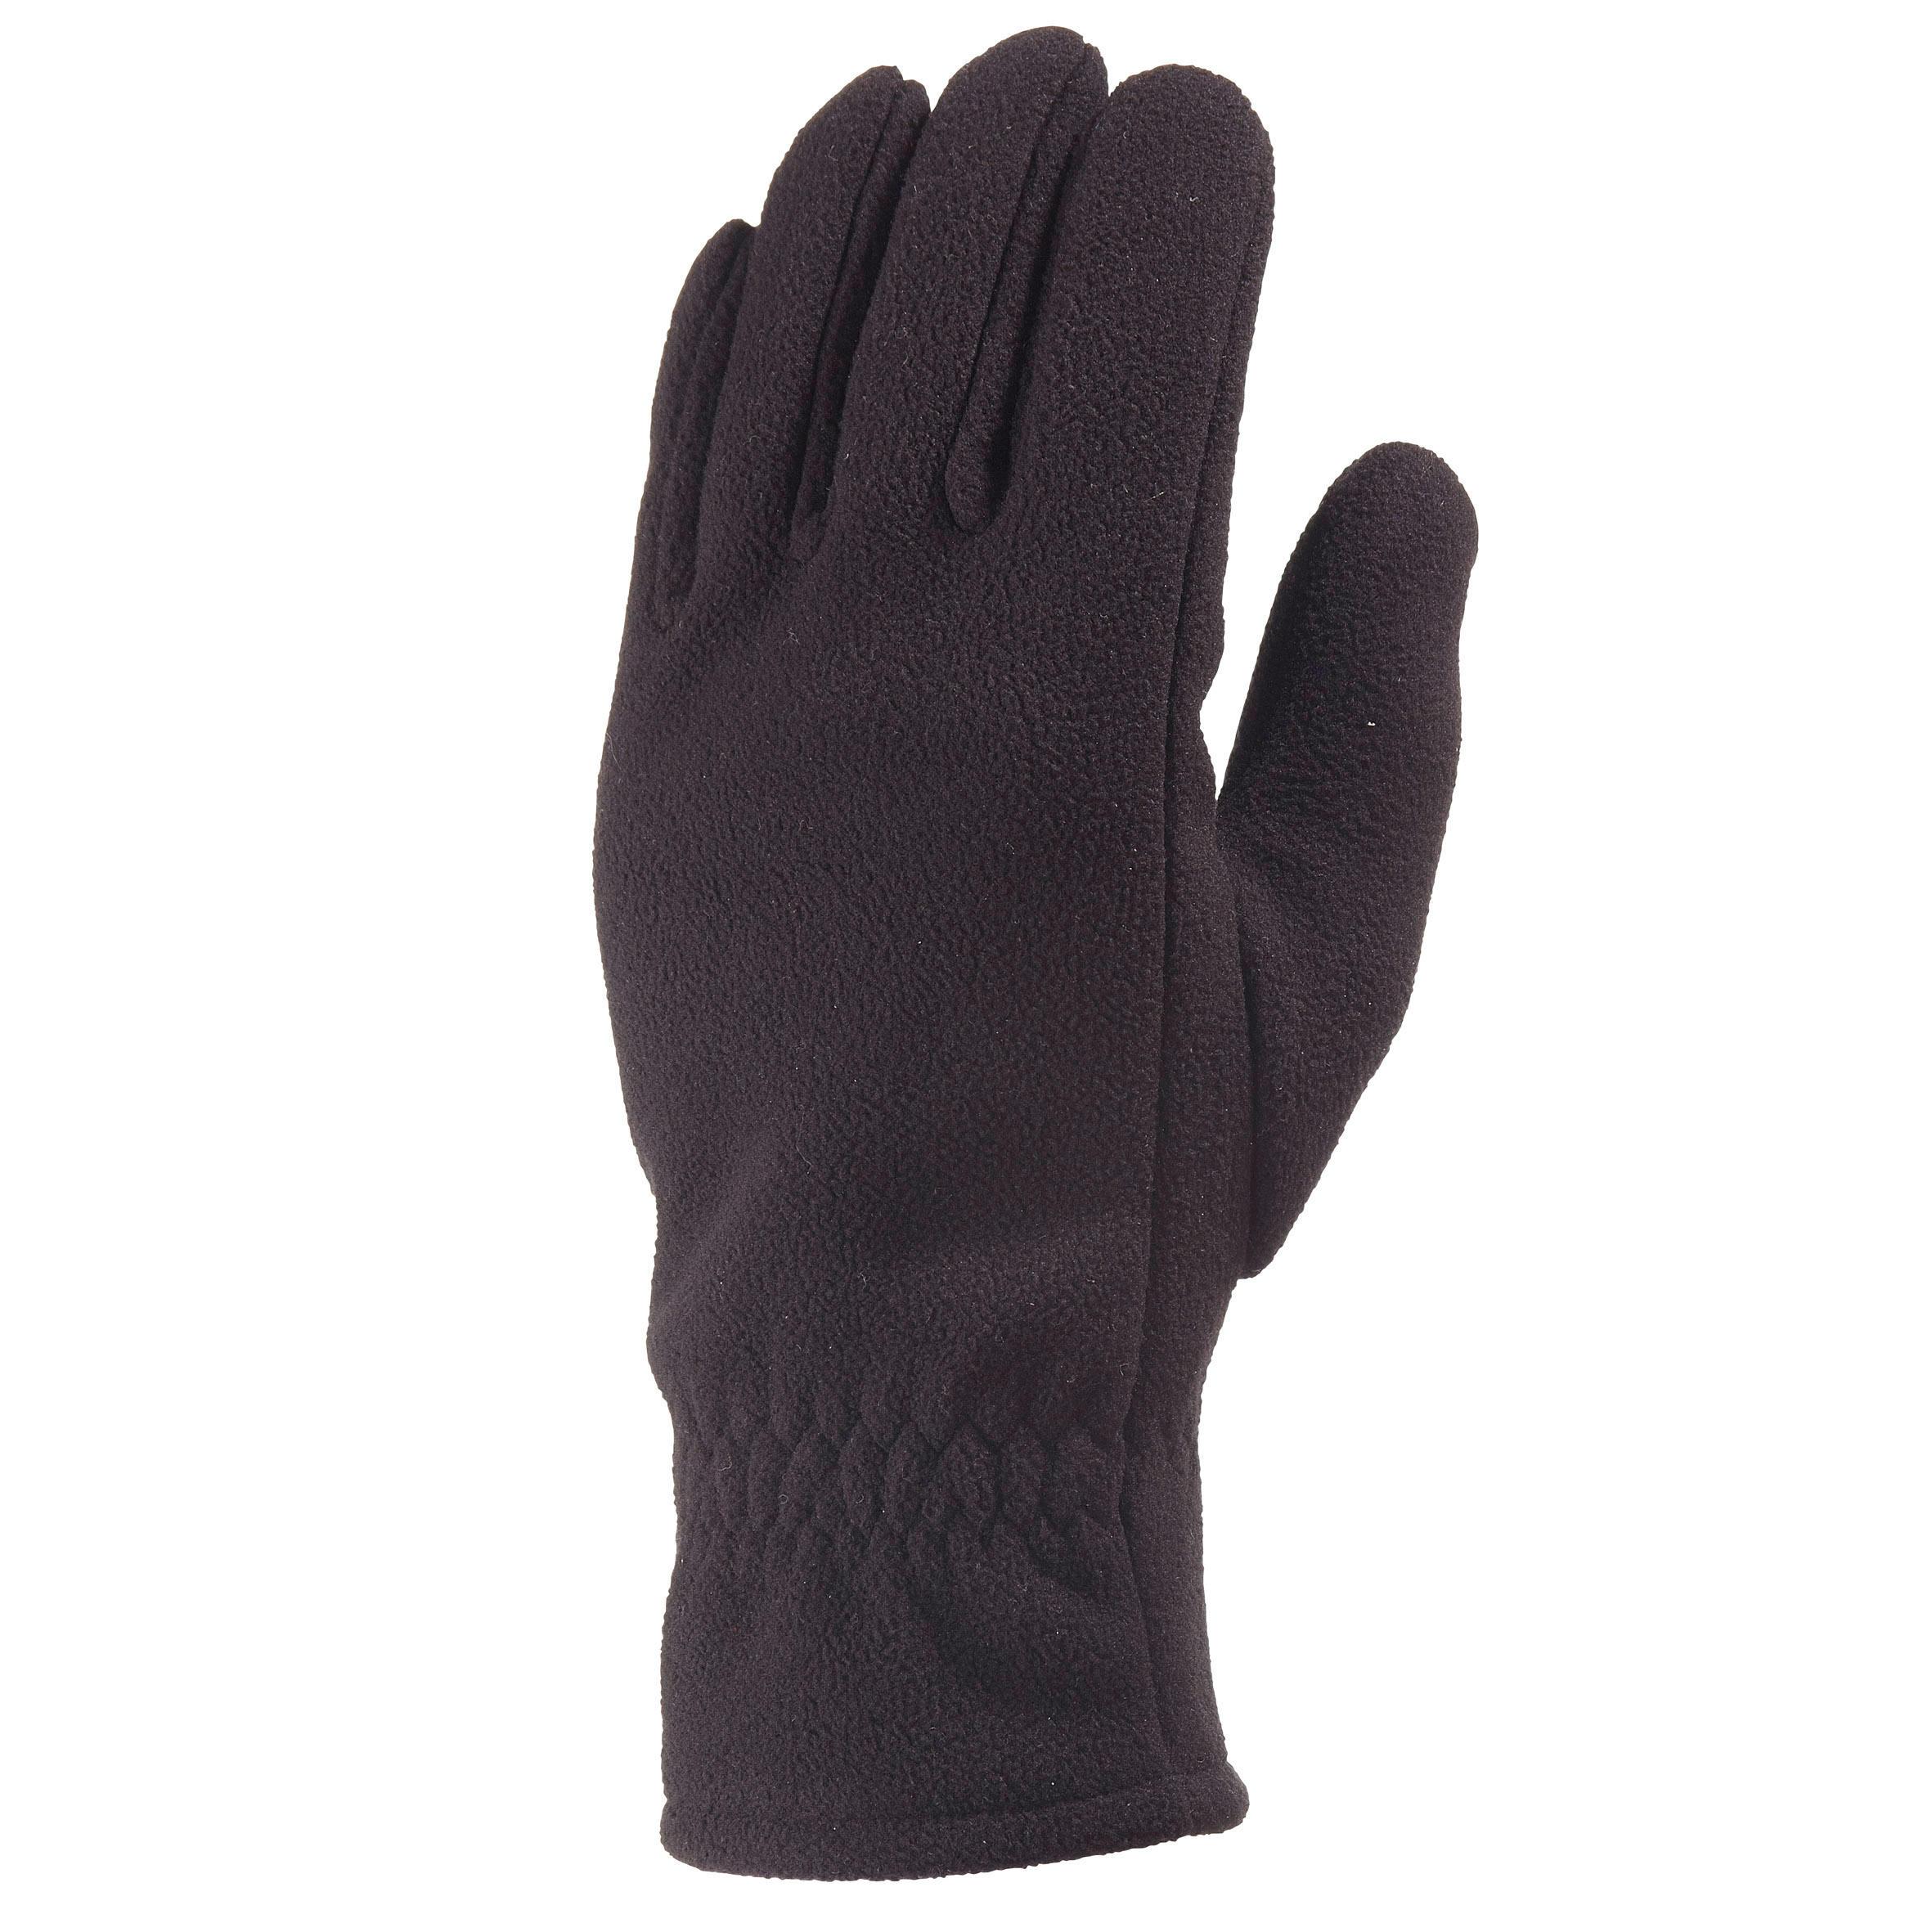 Handschuhe Trek 500 Fleece Erwachsene schwarz | Accessoires > Handschuhe | Schwarz - Grau | Quechua